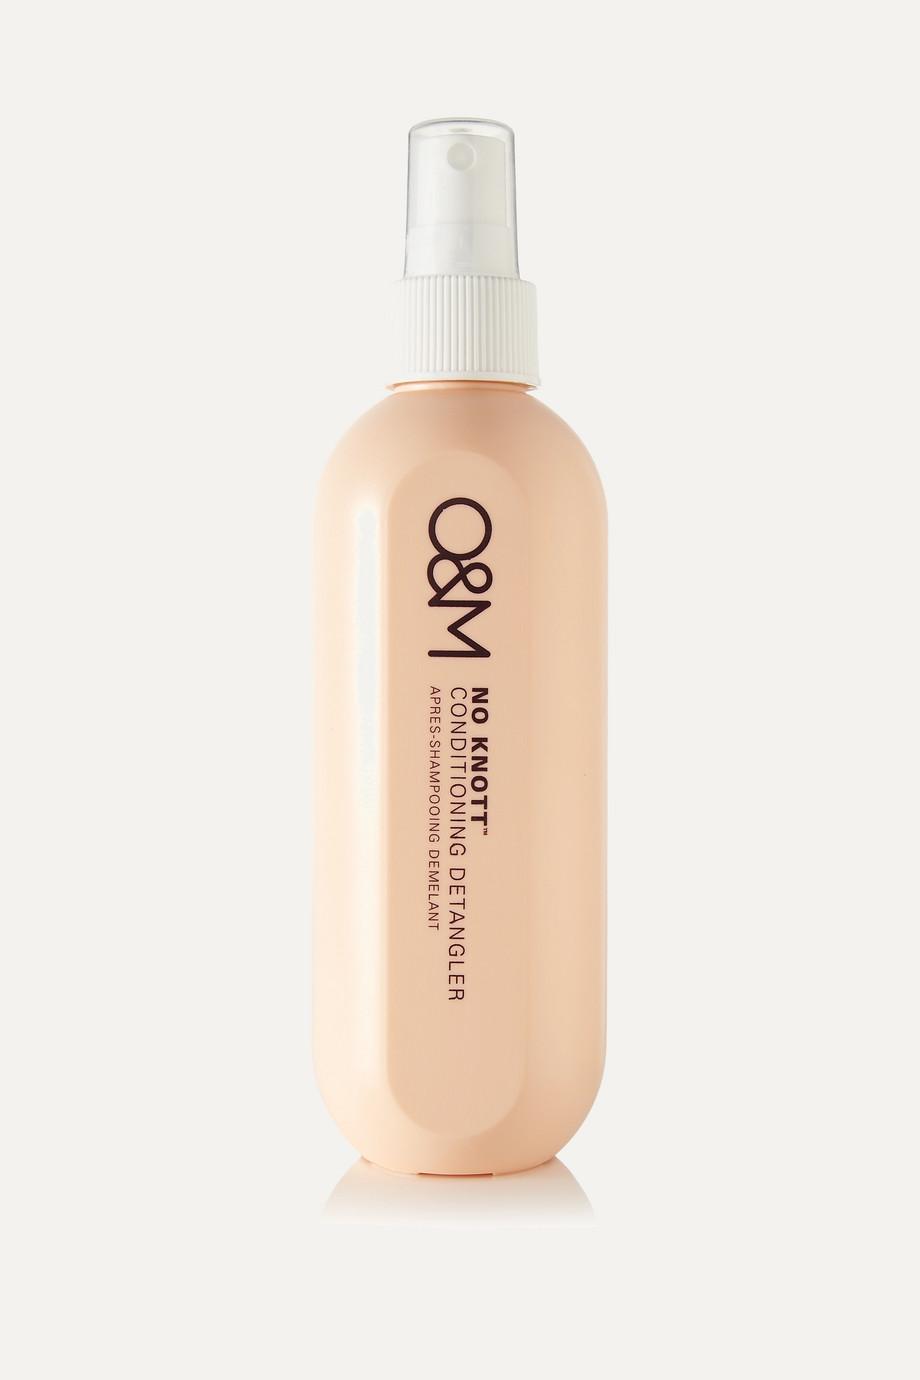 Original & Mineral Know Knott Detangling Spray, 250ml